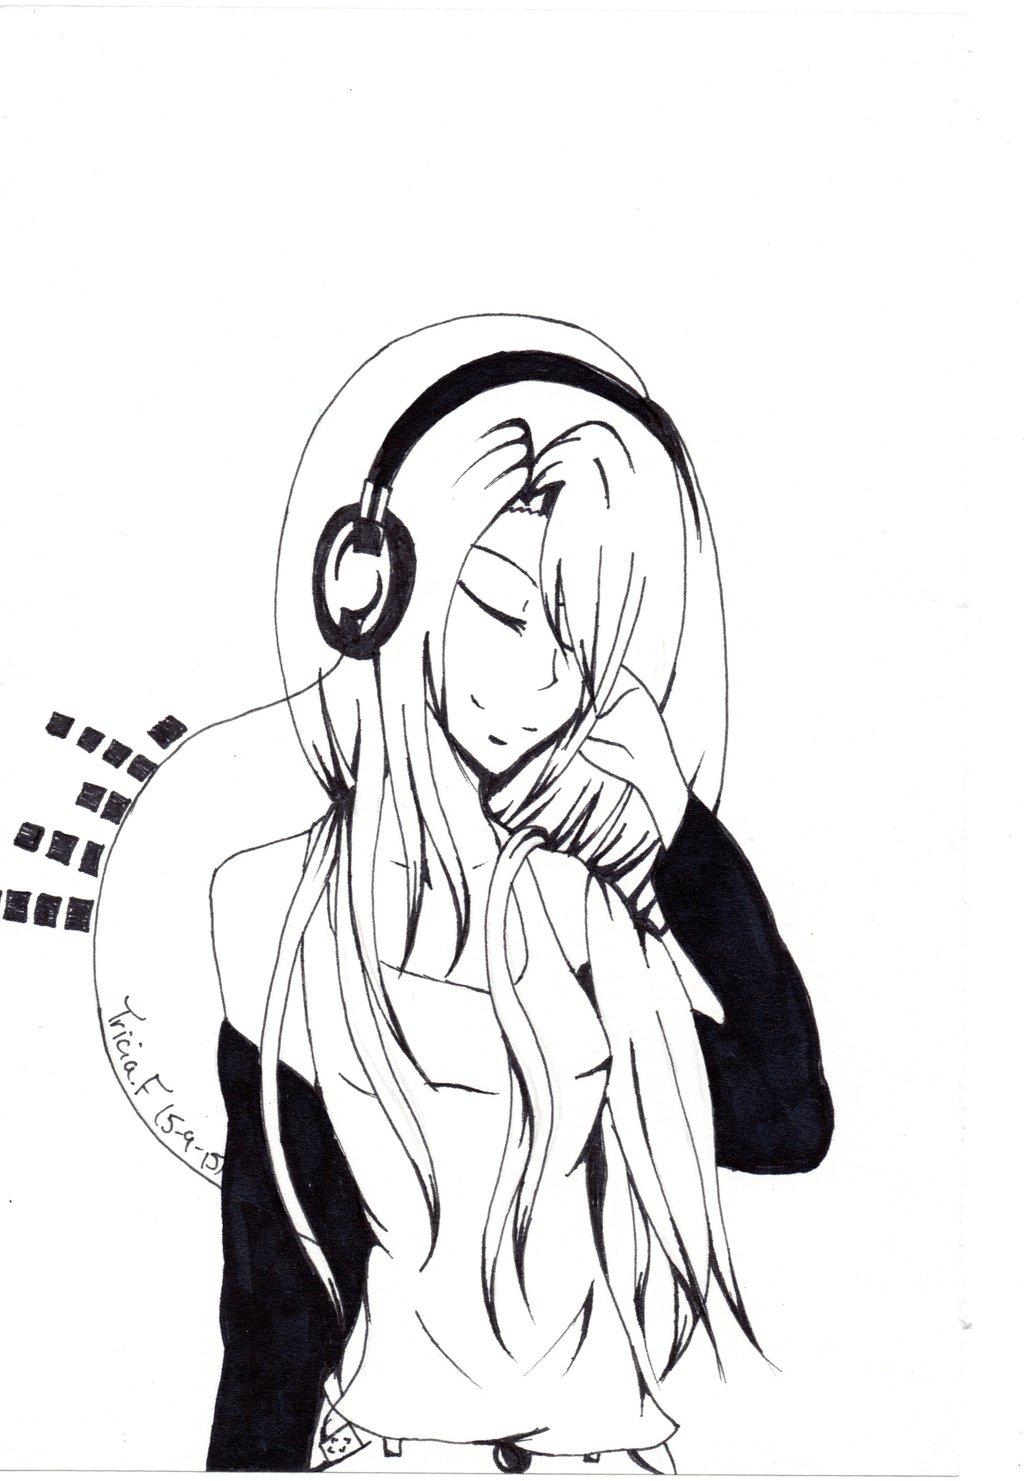 1024x1481 Headphone Anime Girl By Triciacreations